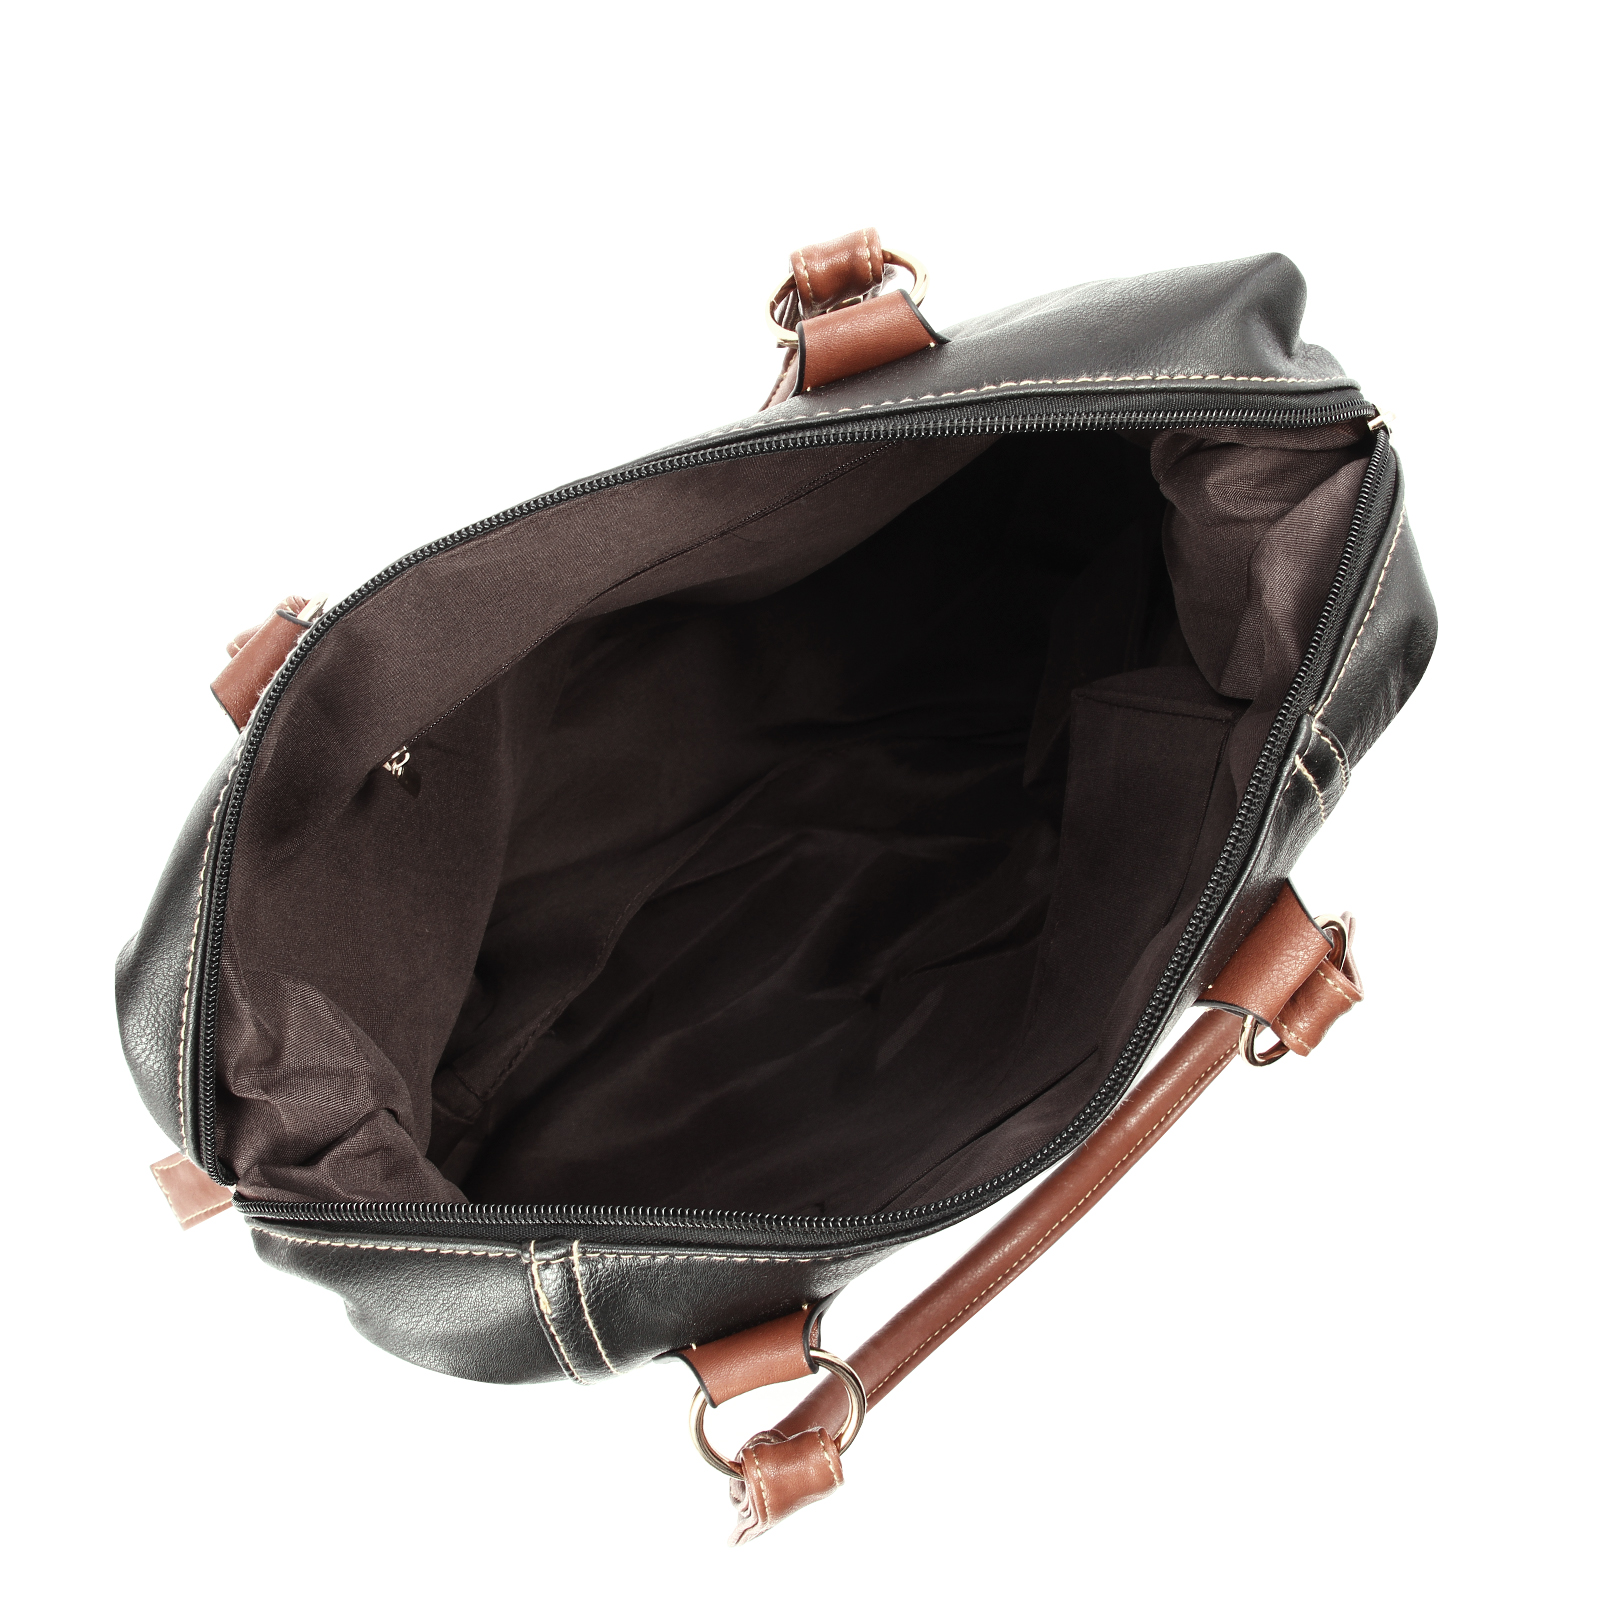 sac a main epaule tote plage travail sacoche cartable pu. Black Bedroom Furniture Sets. Home Design Ideas